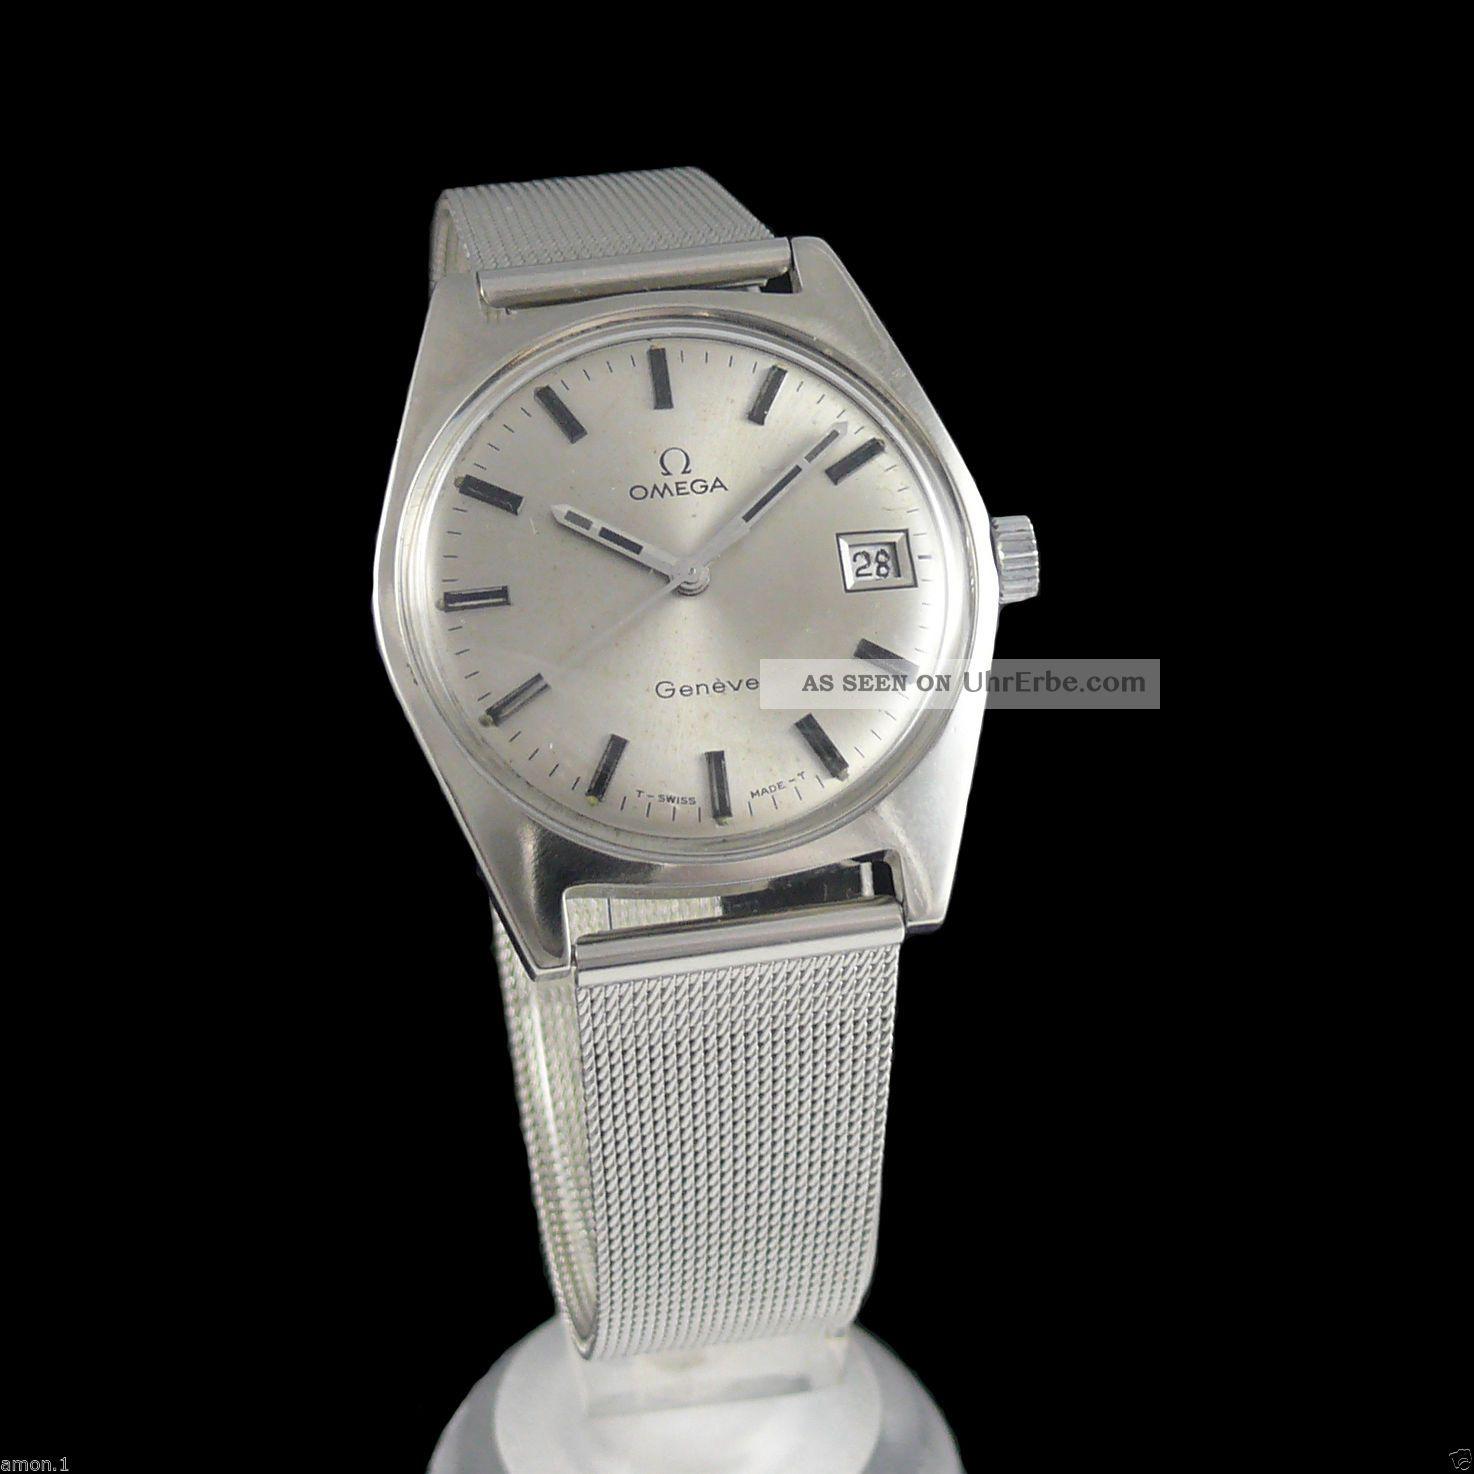 Herrenuhr Omega Geneve Mit Datum,  Edelsthal Cal.  Omega613 Armbanduhren Bild